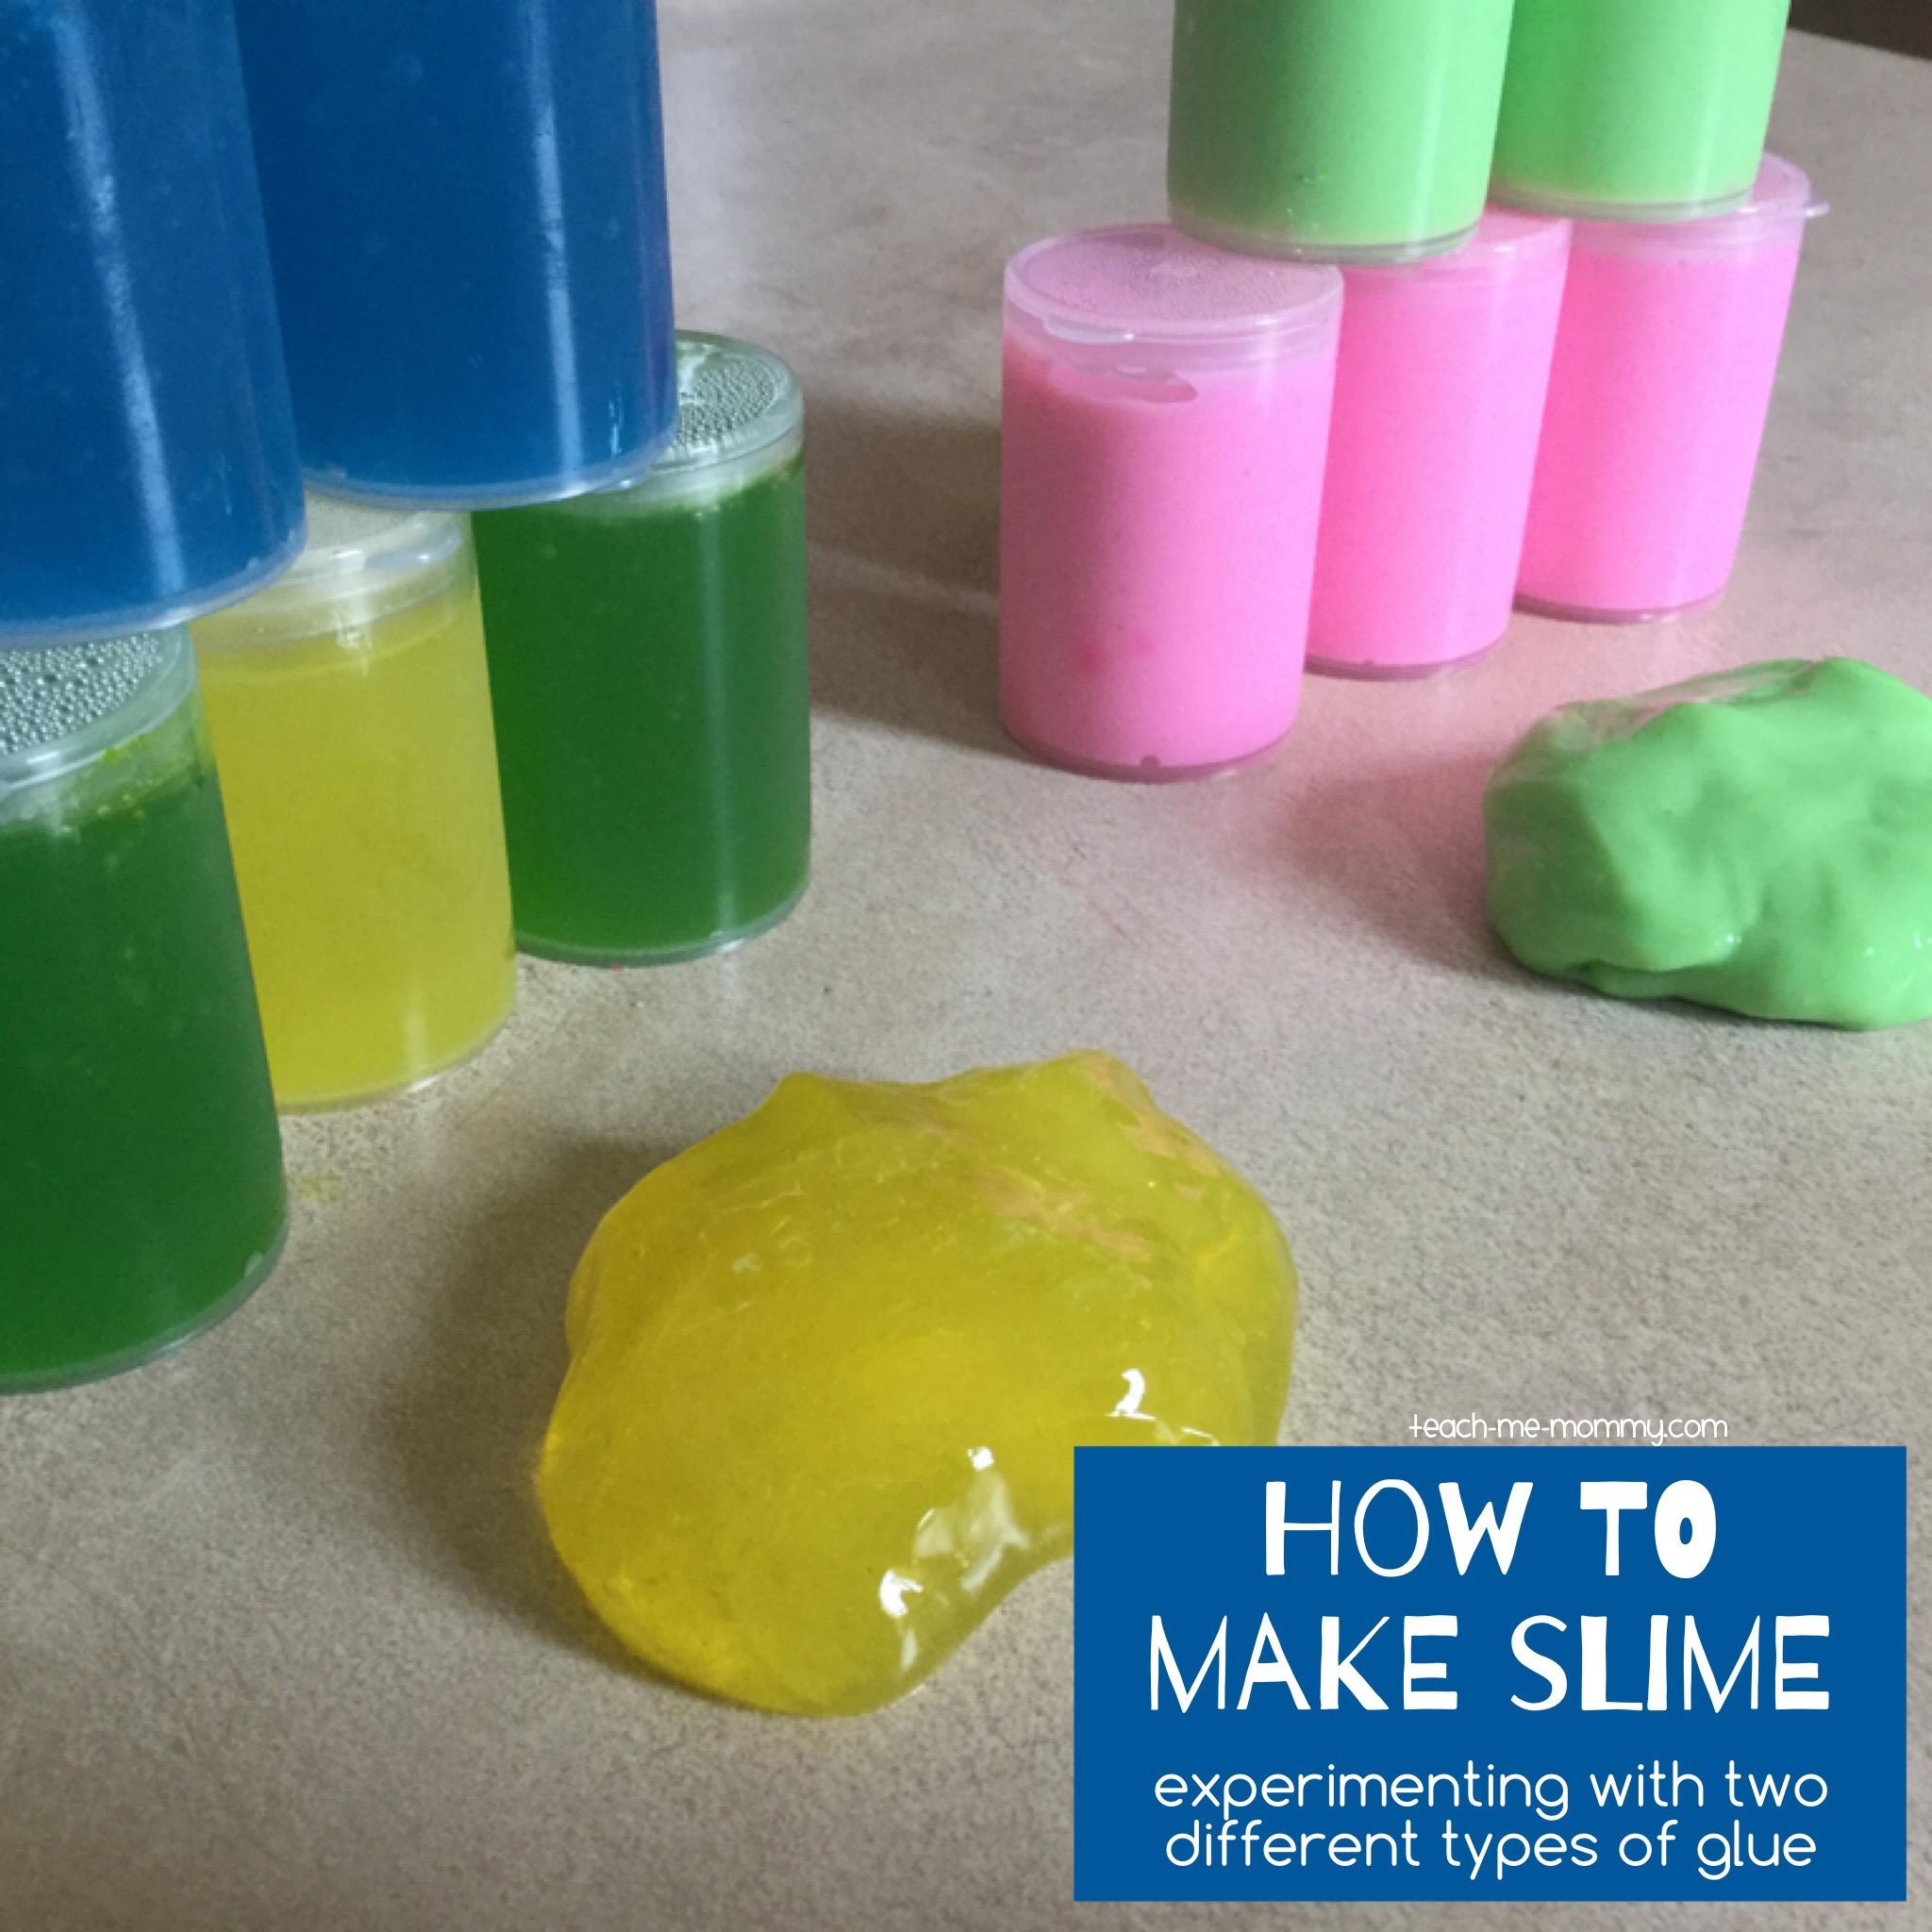 How to make slime - Teach Me Mommy